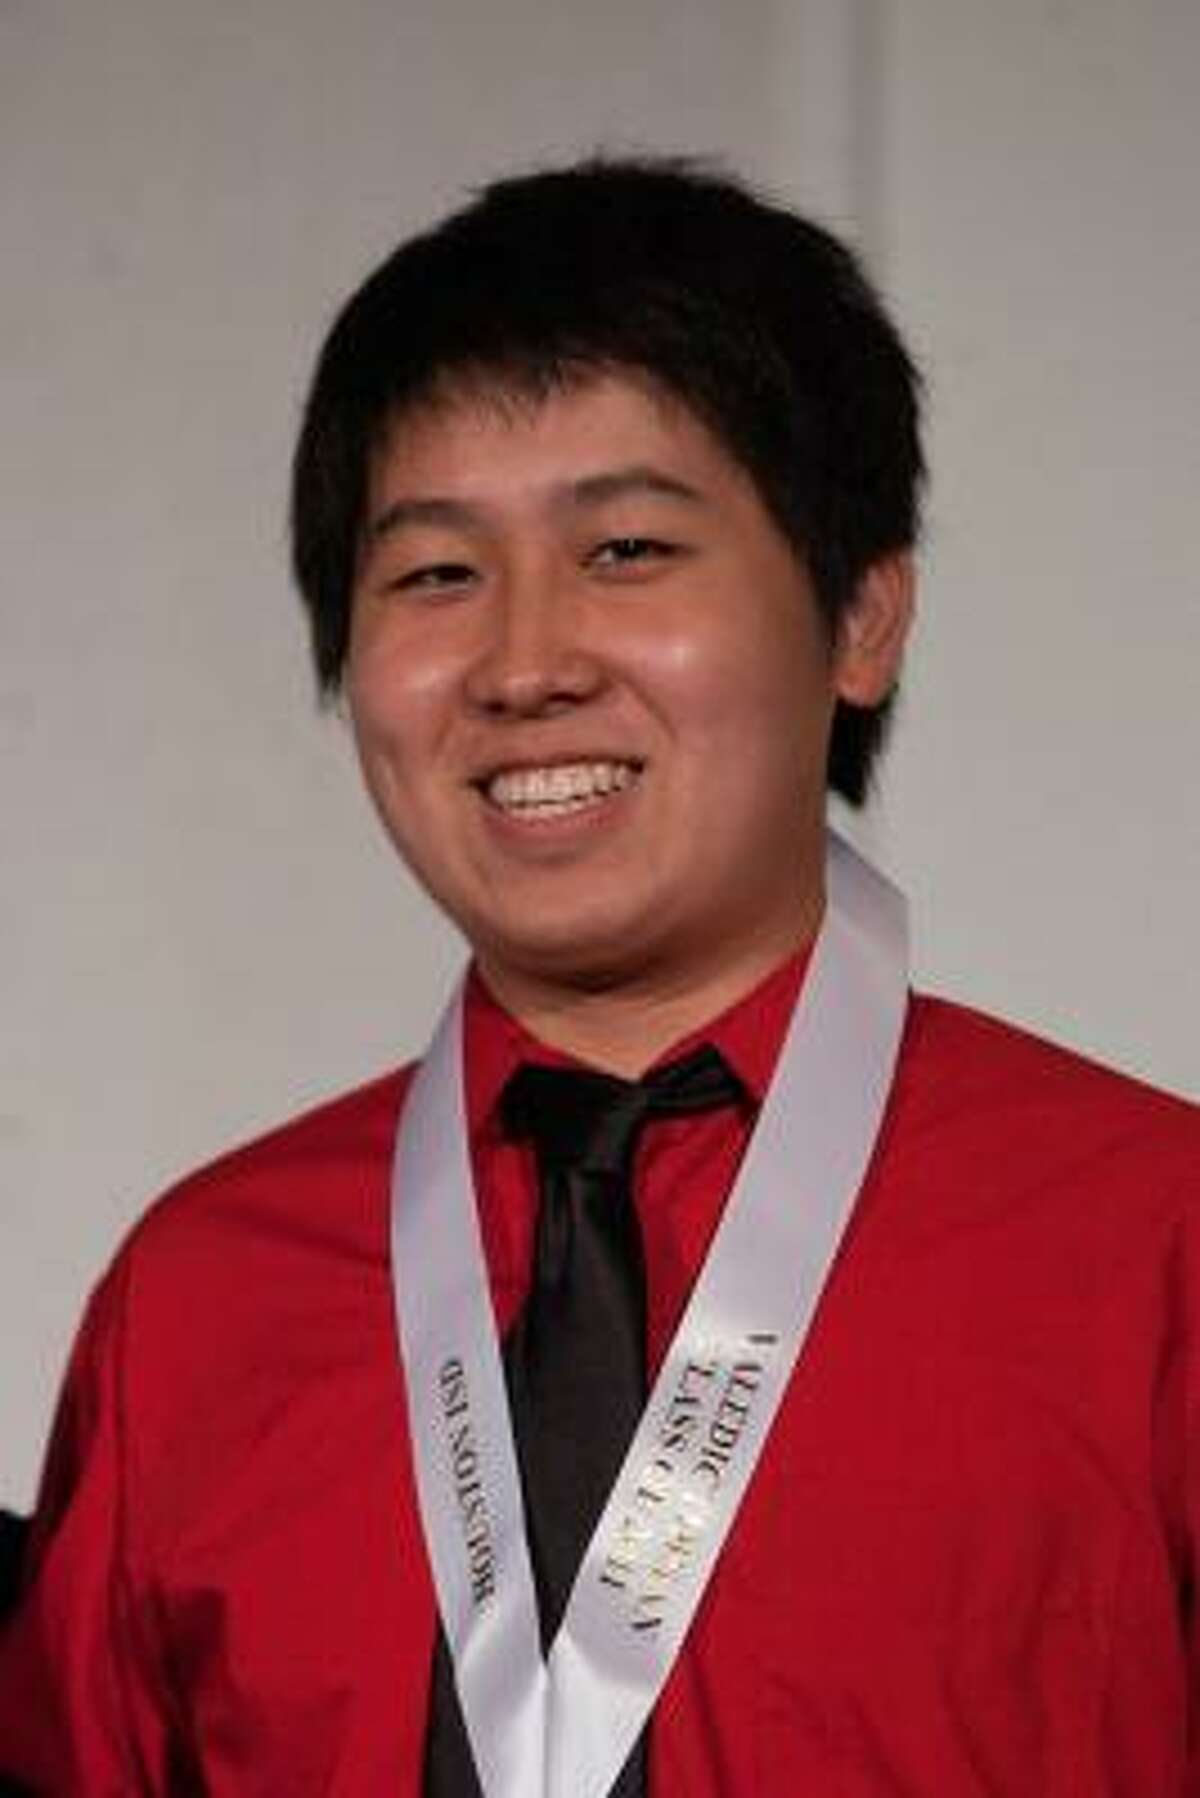 Yue Wu, Bellaire High School Class rank: Valedictorian